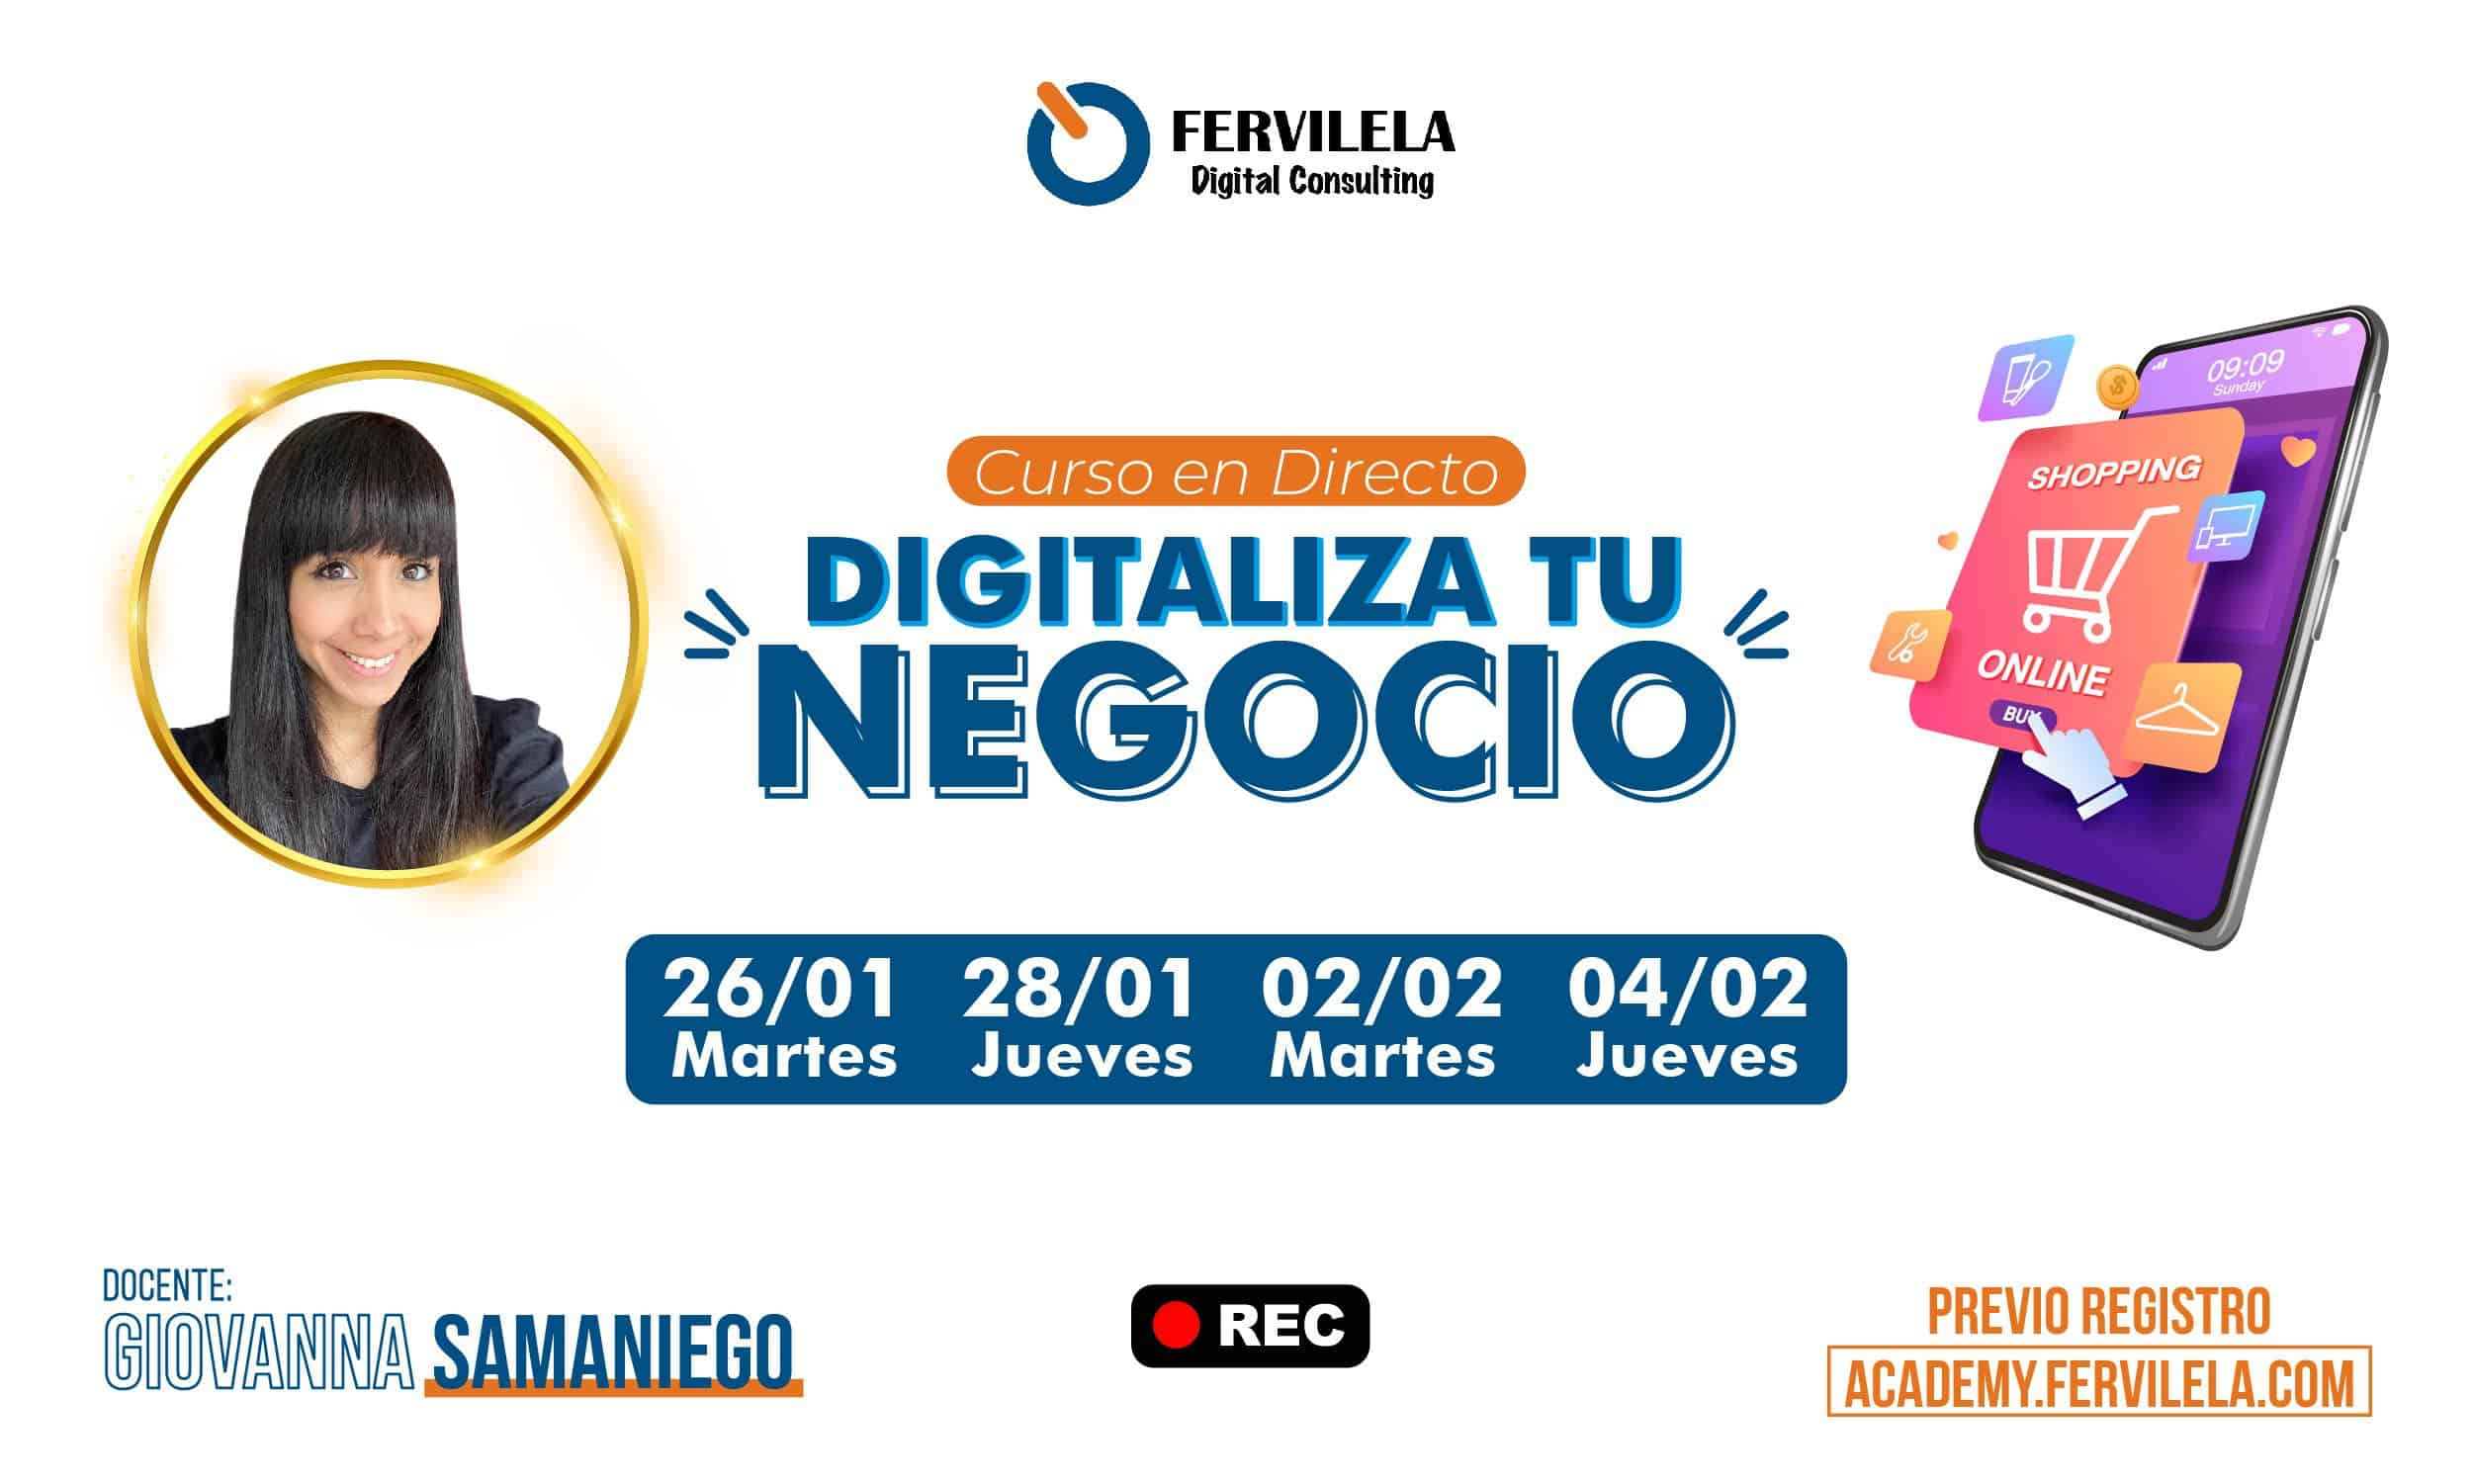 DIGITALIZA TU NEGOCIO PORTADA-02